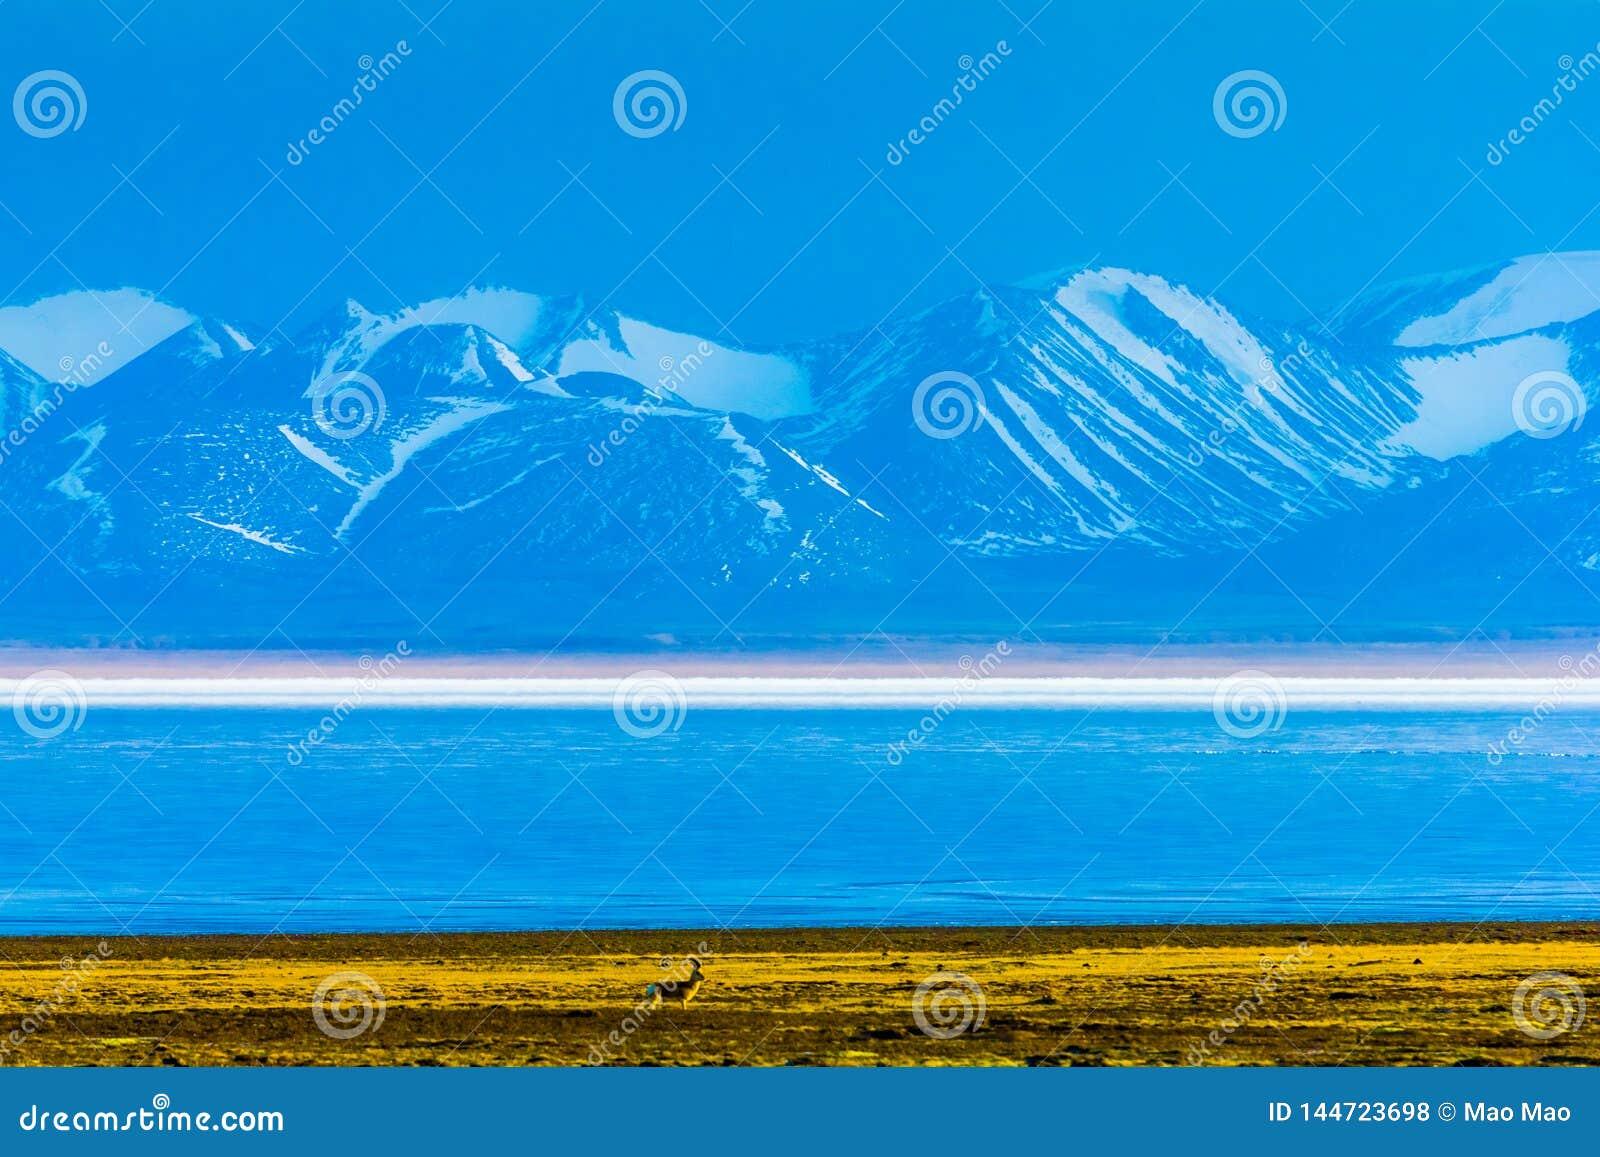 Hala Lake e la neve hanno ricoperto la catena montuosa di Qilian, Qinghai-Tibet Platea, Cina